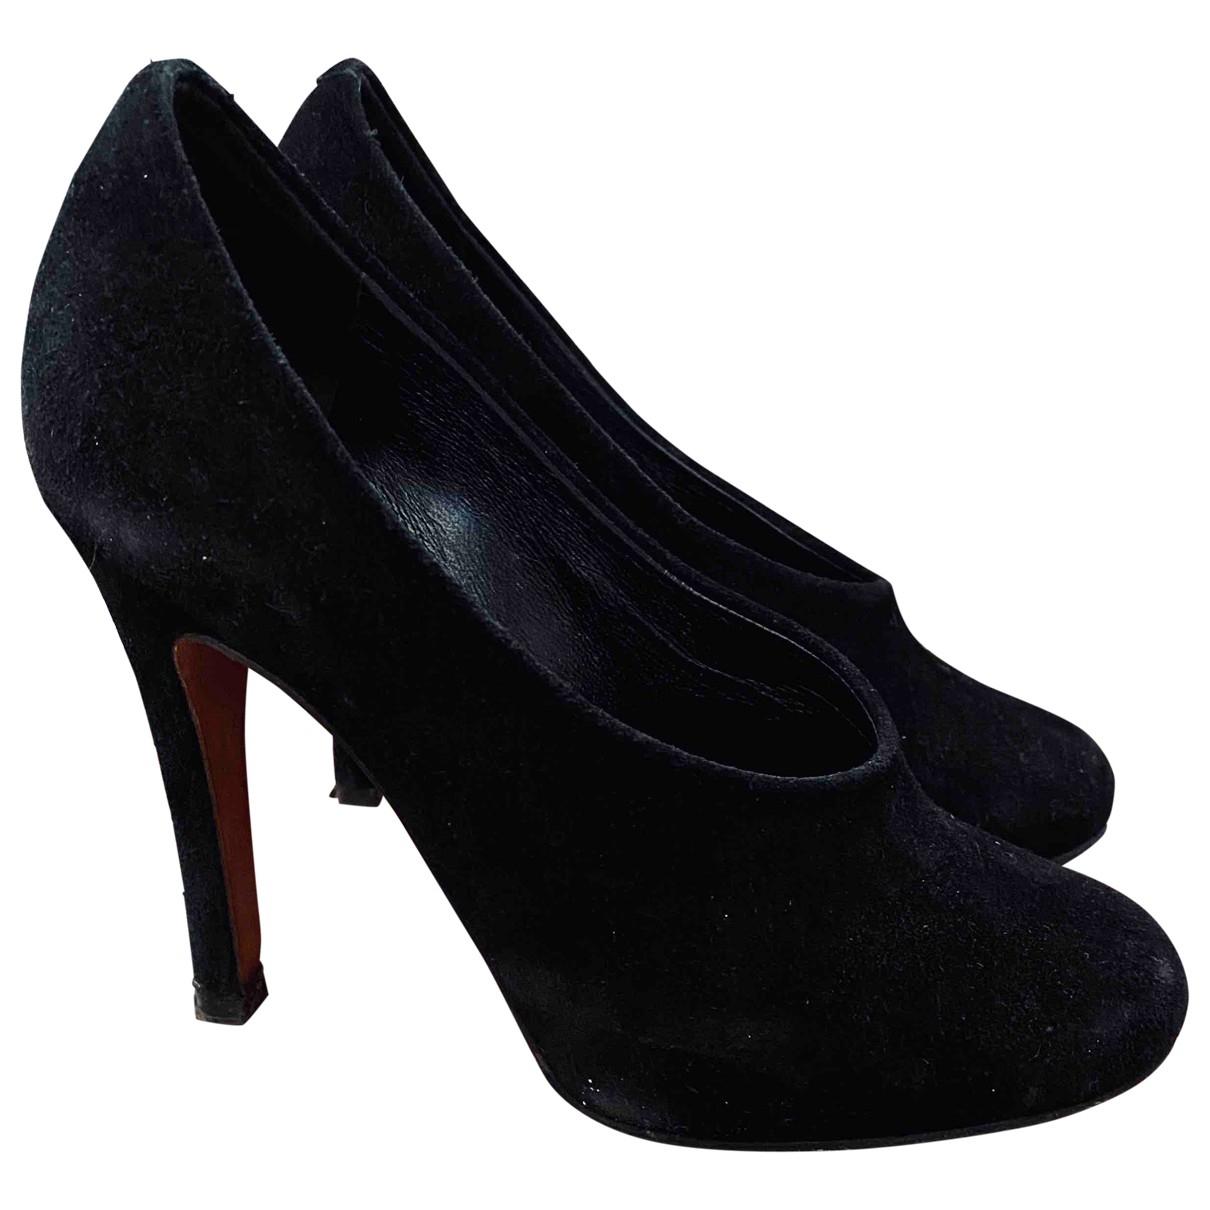 Chloé \N Black Suede Heels for Women 36 EU